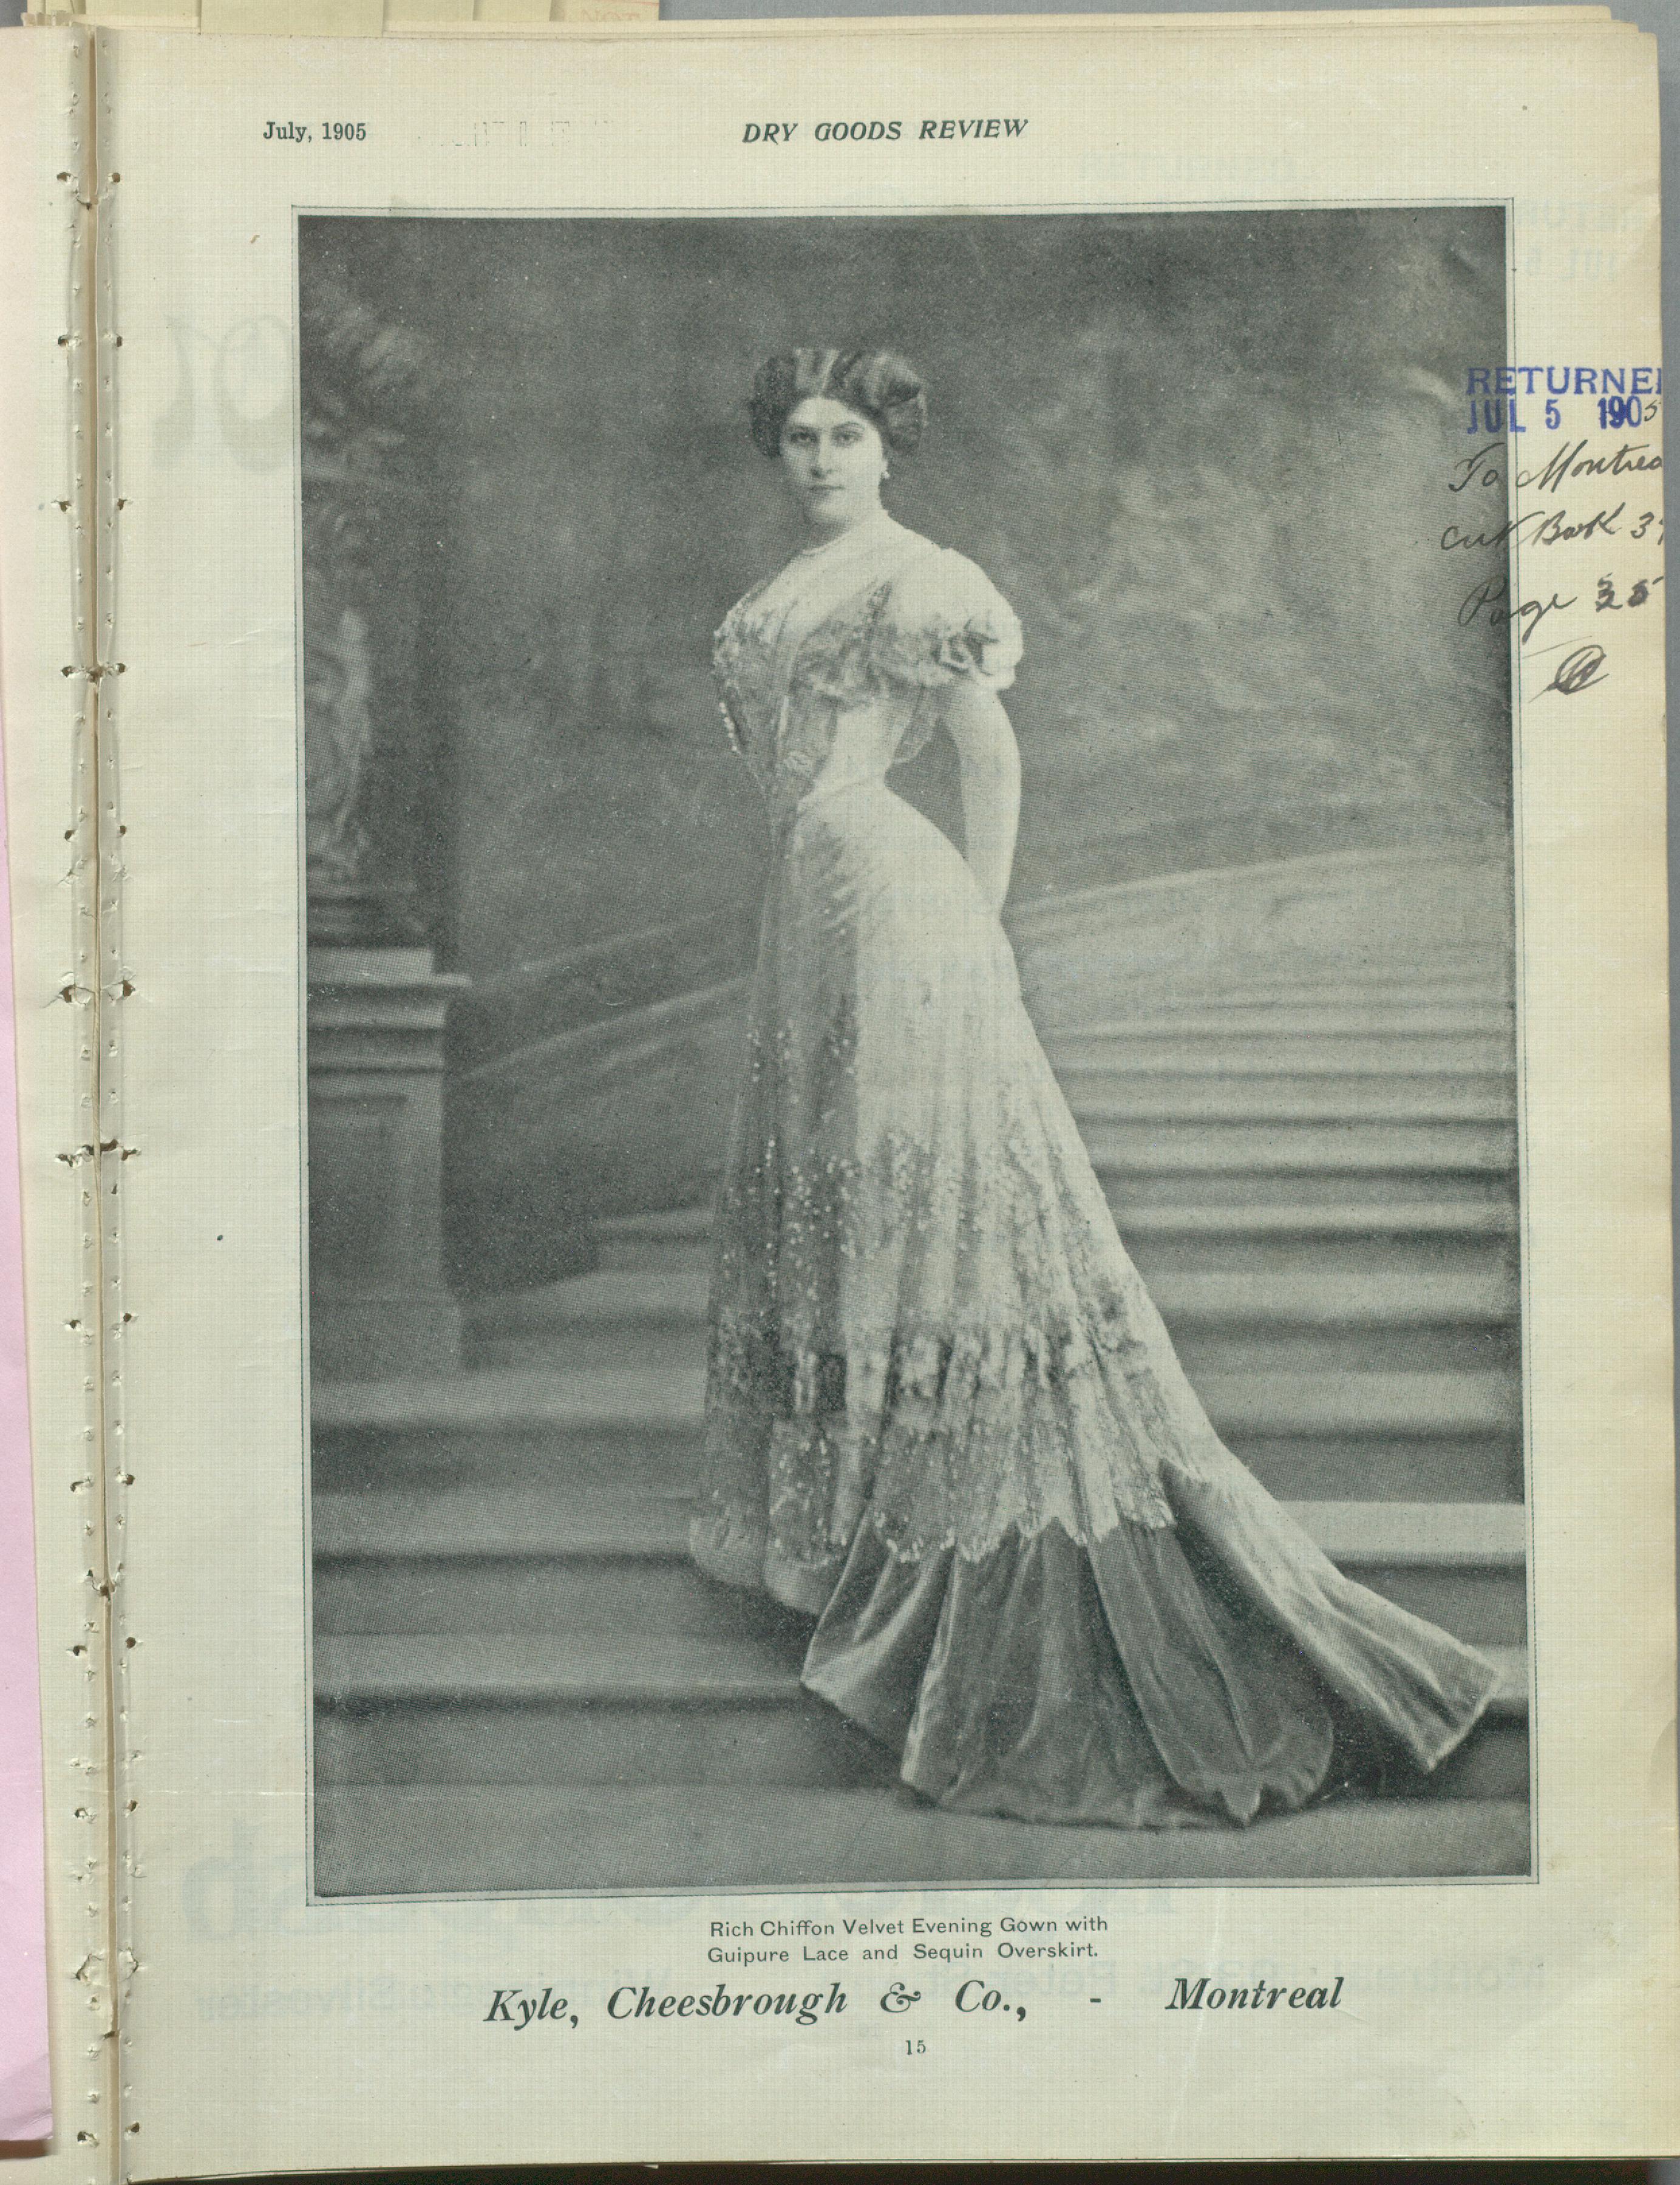 Canada Fashion Magazine: 36. 1905 Dry Goods Review